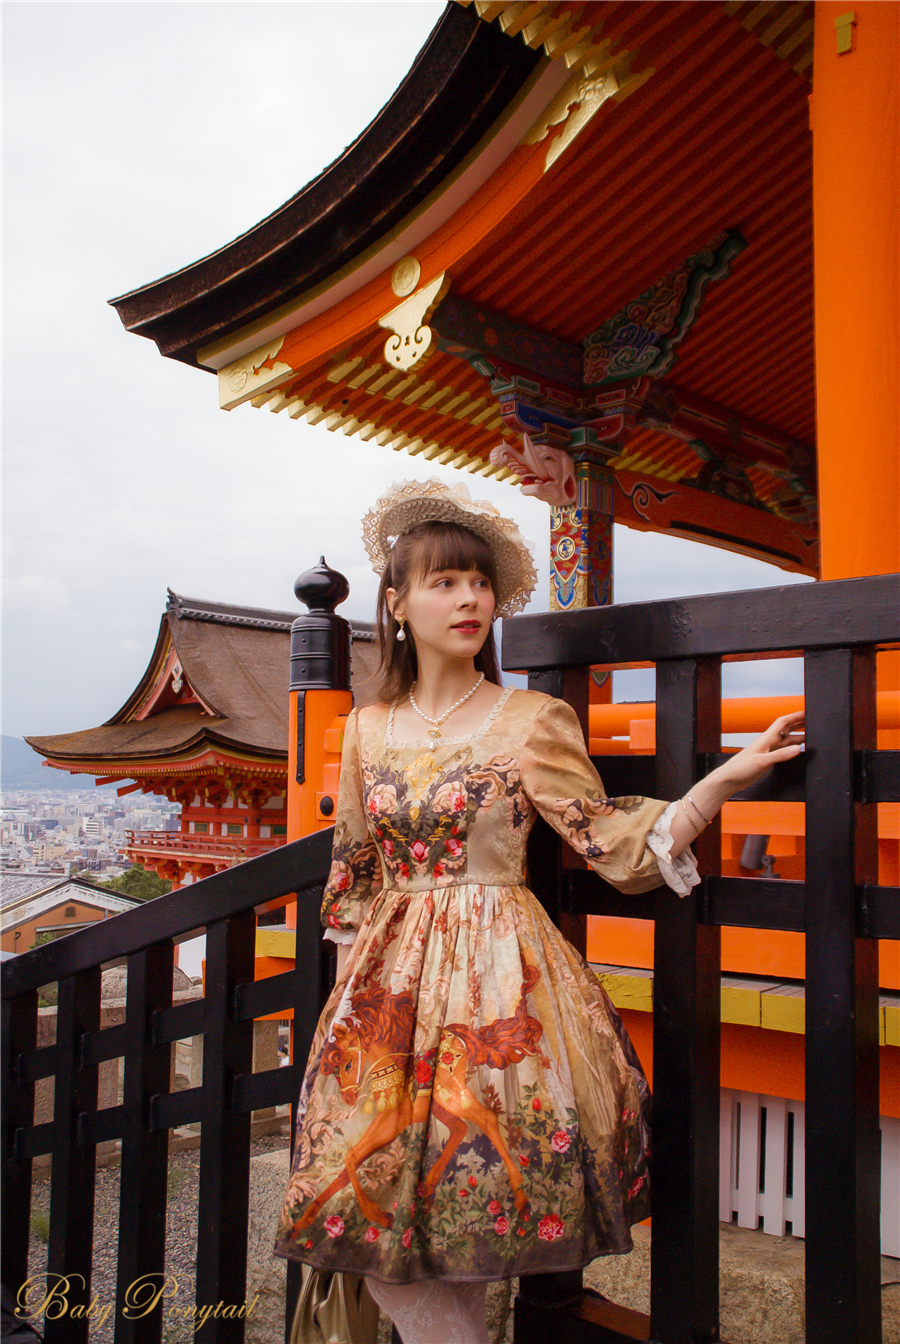 BabyPonytail_Rose Battle_Model Photo_OP Amber_Claudia_02.jpg